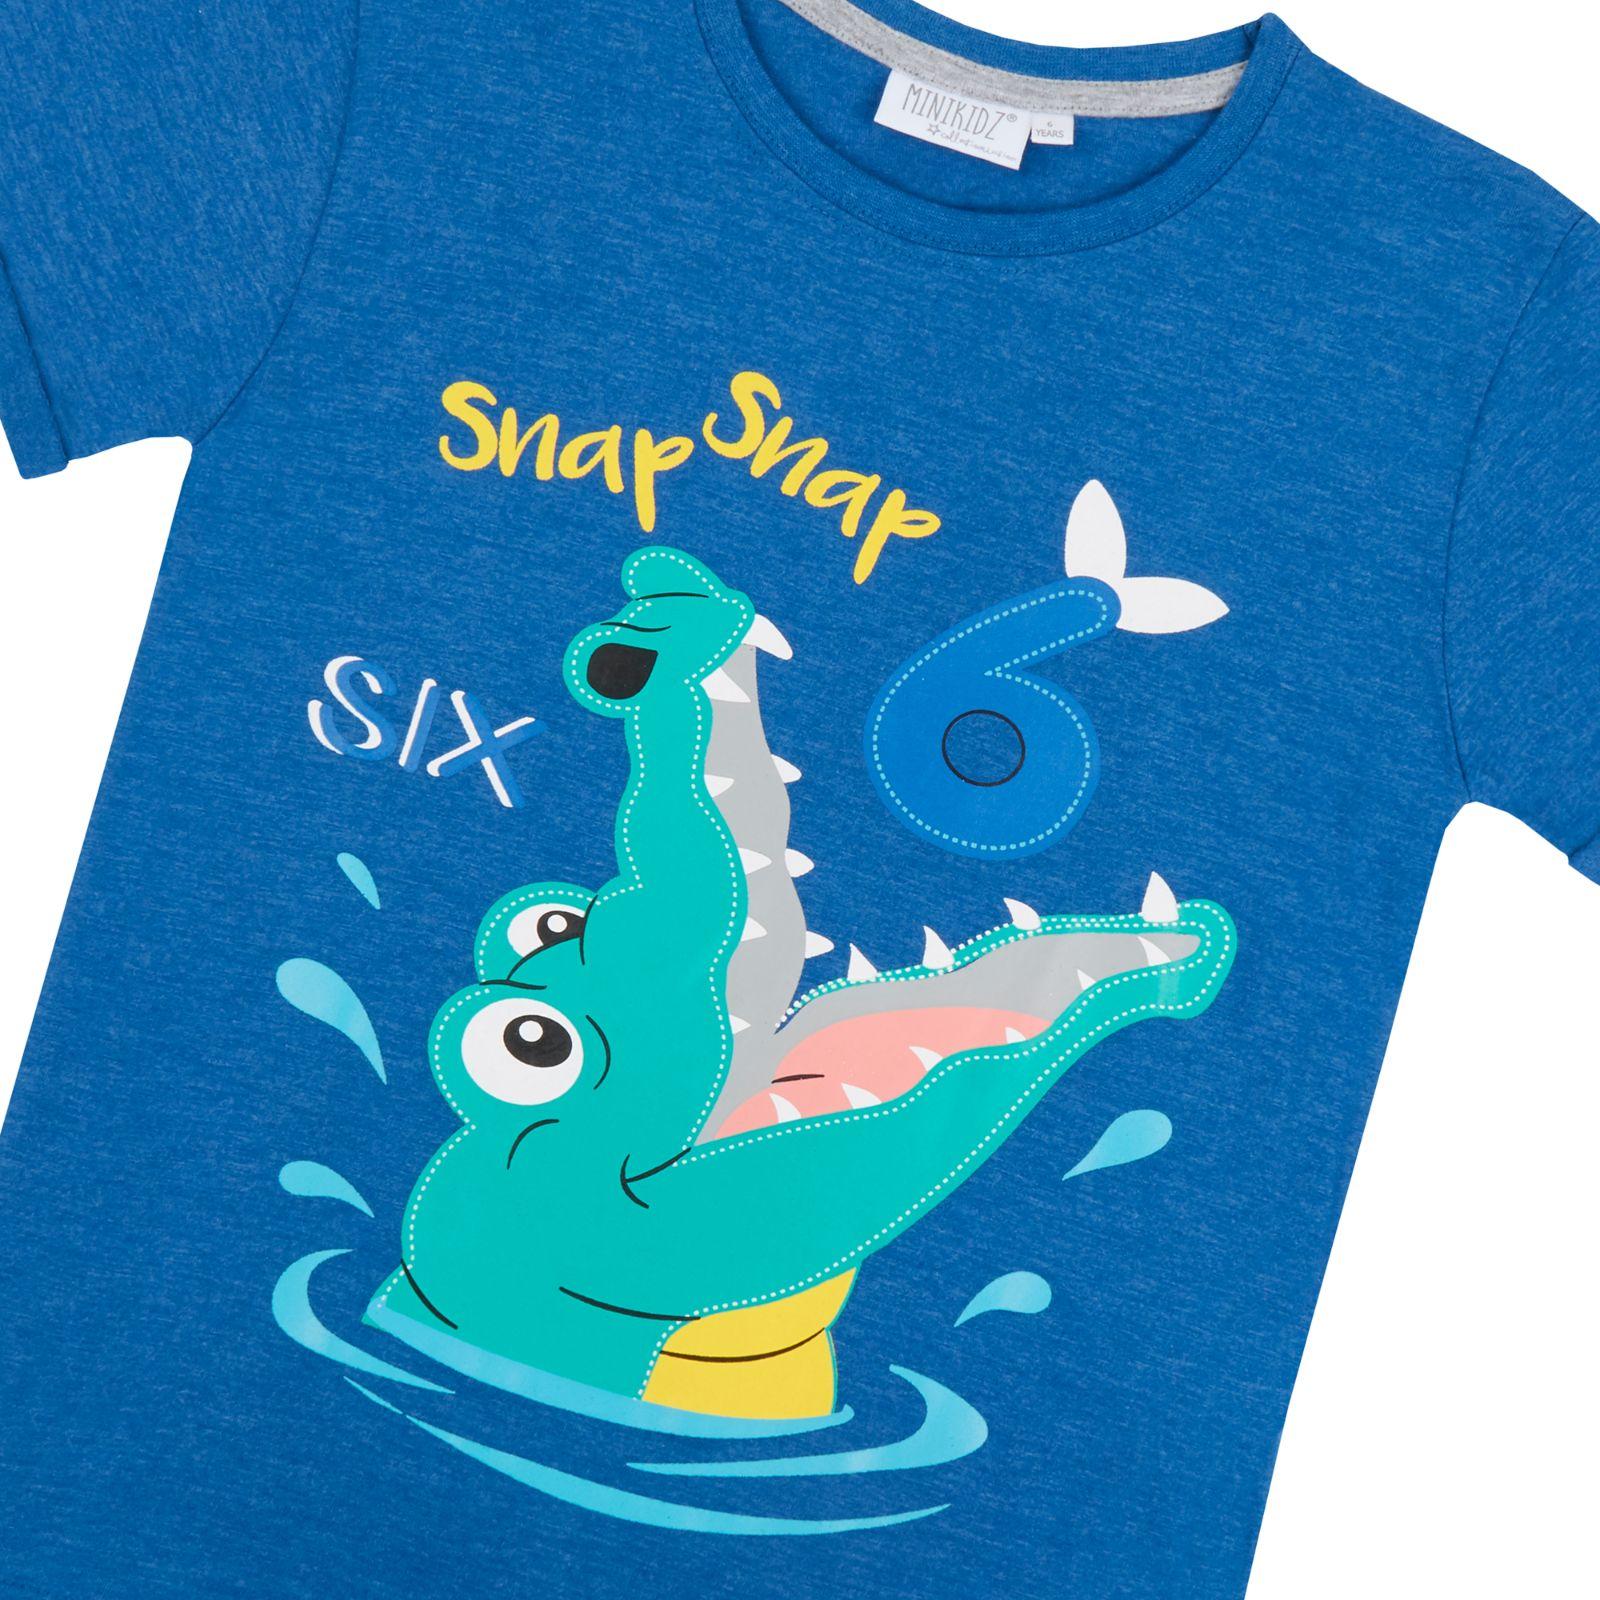 Kids /'Racing car /& track t shirt I am 3 I am 1,I am 2 I am 4 for birthdays